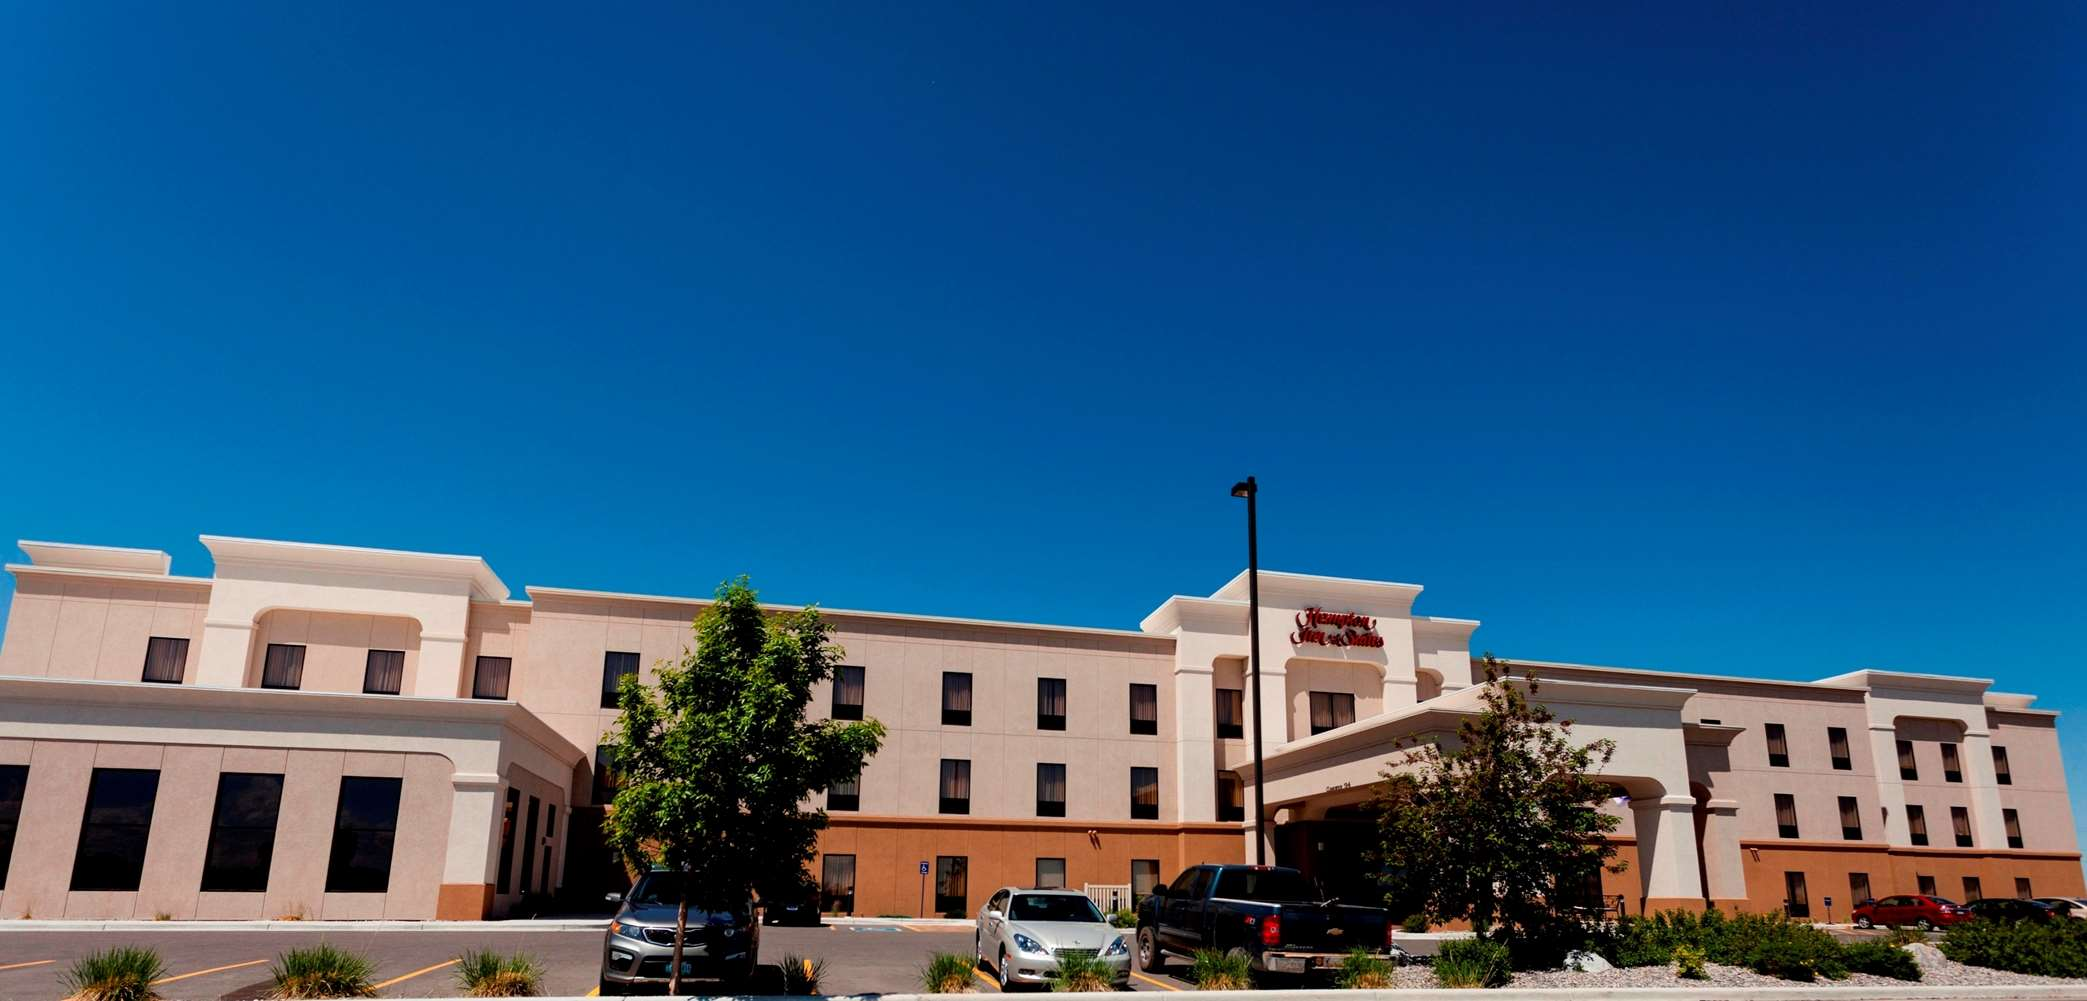 Hampton Inn & Suites Riverton image 26